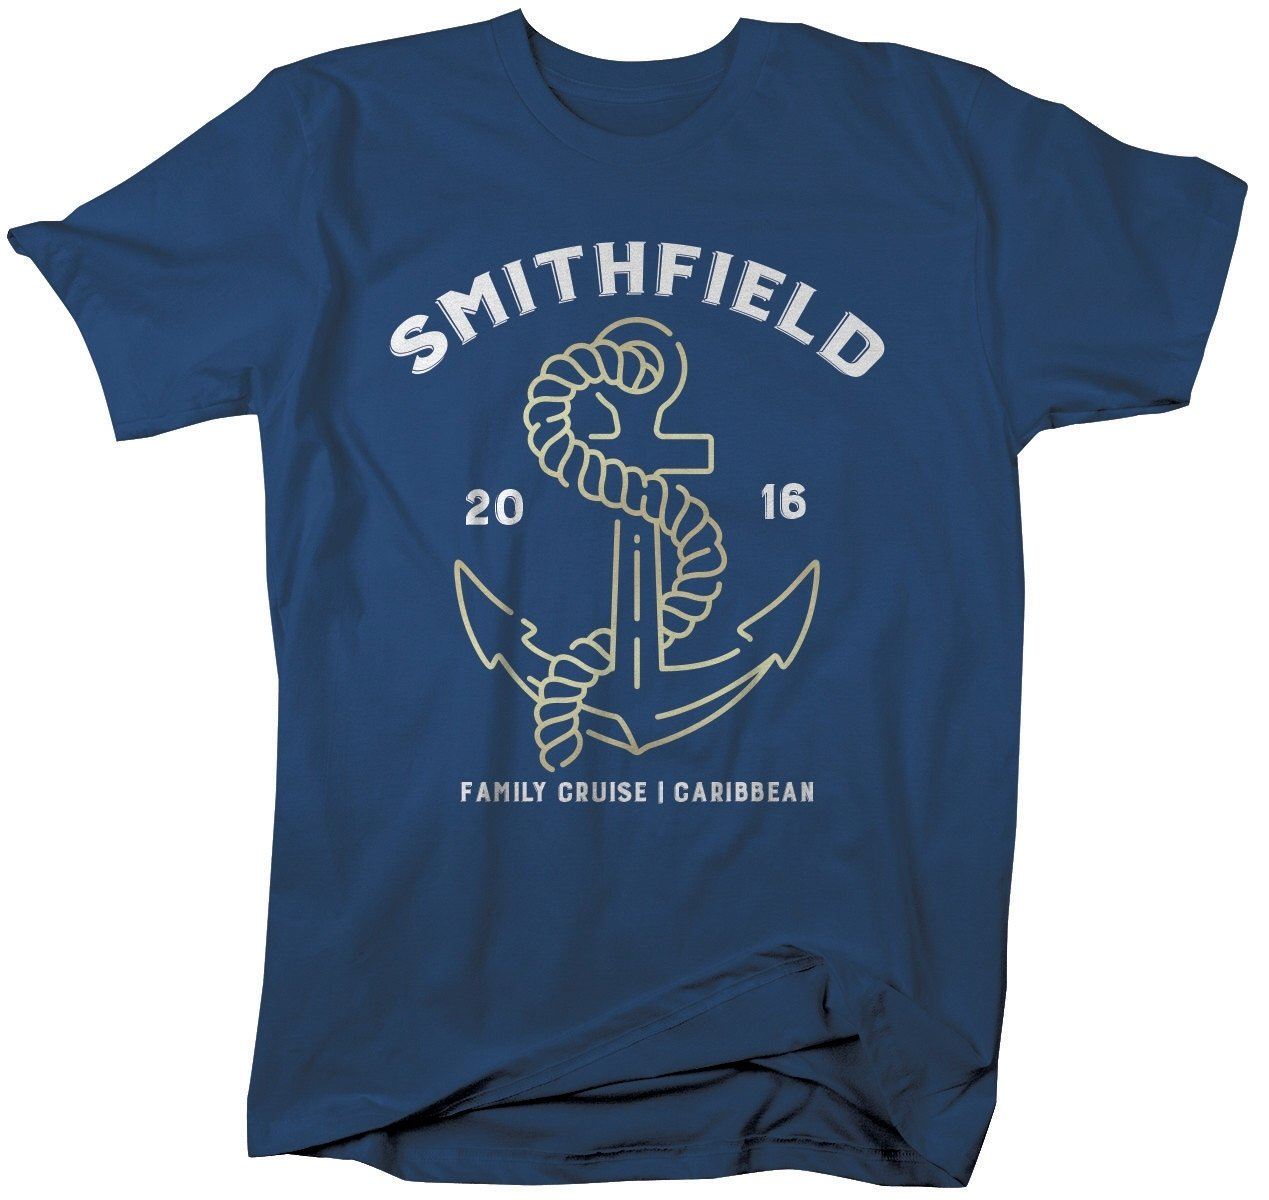 10 Fabulous Family Vacation T Shirt Ideas personalized anchor nautical family cruise shirts t shirt cruise 2021